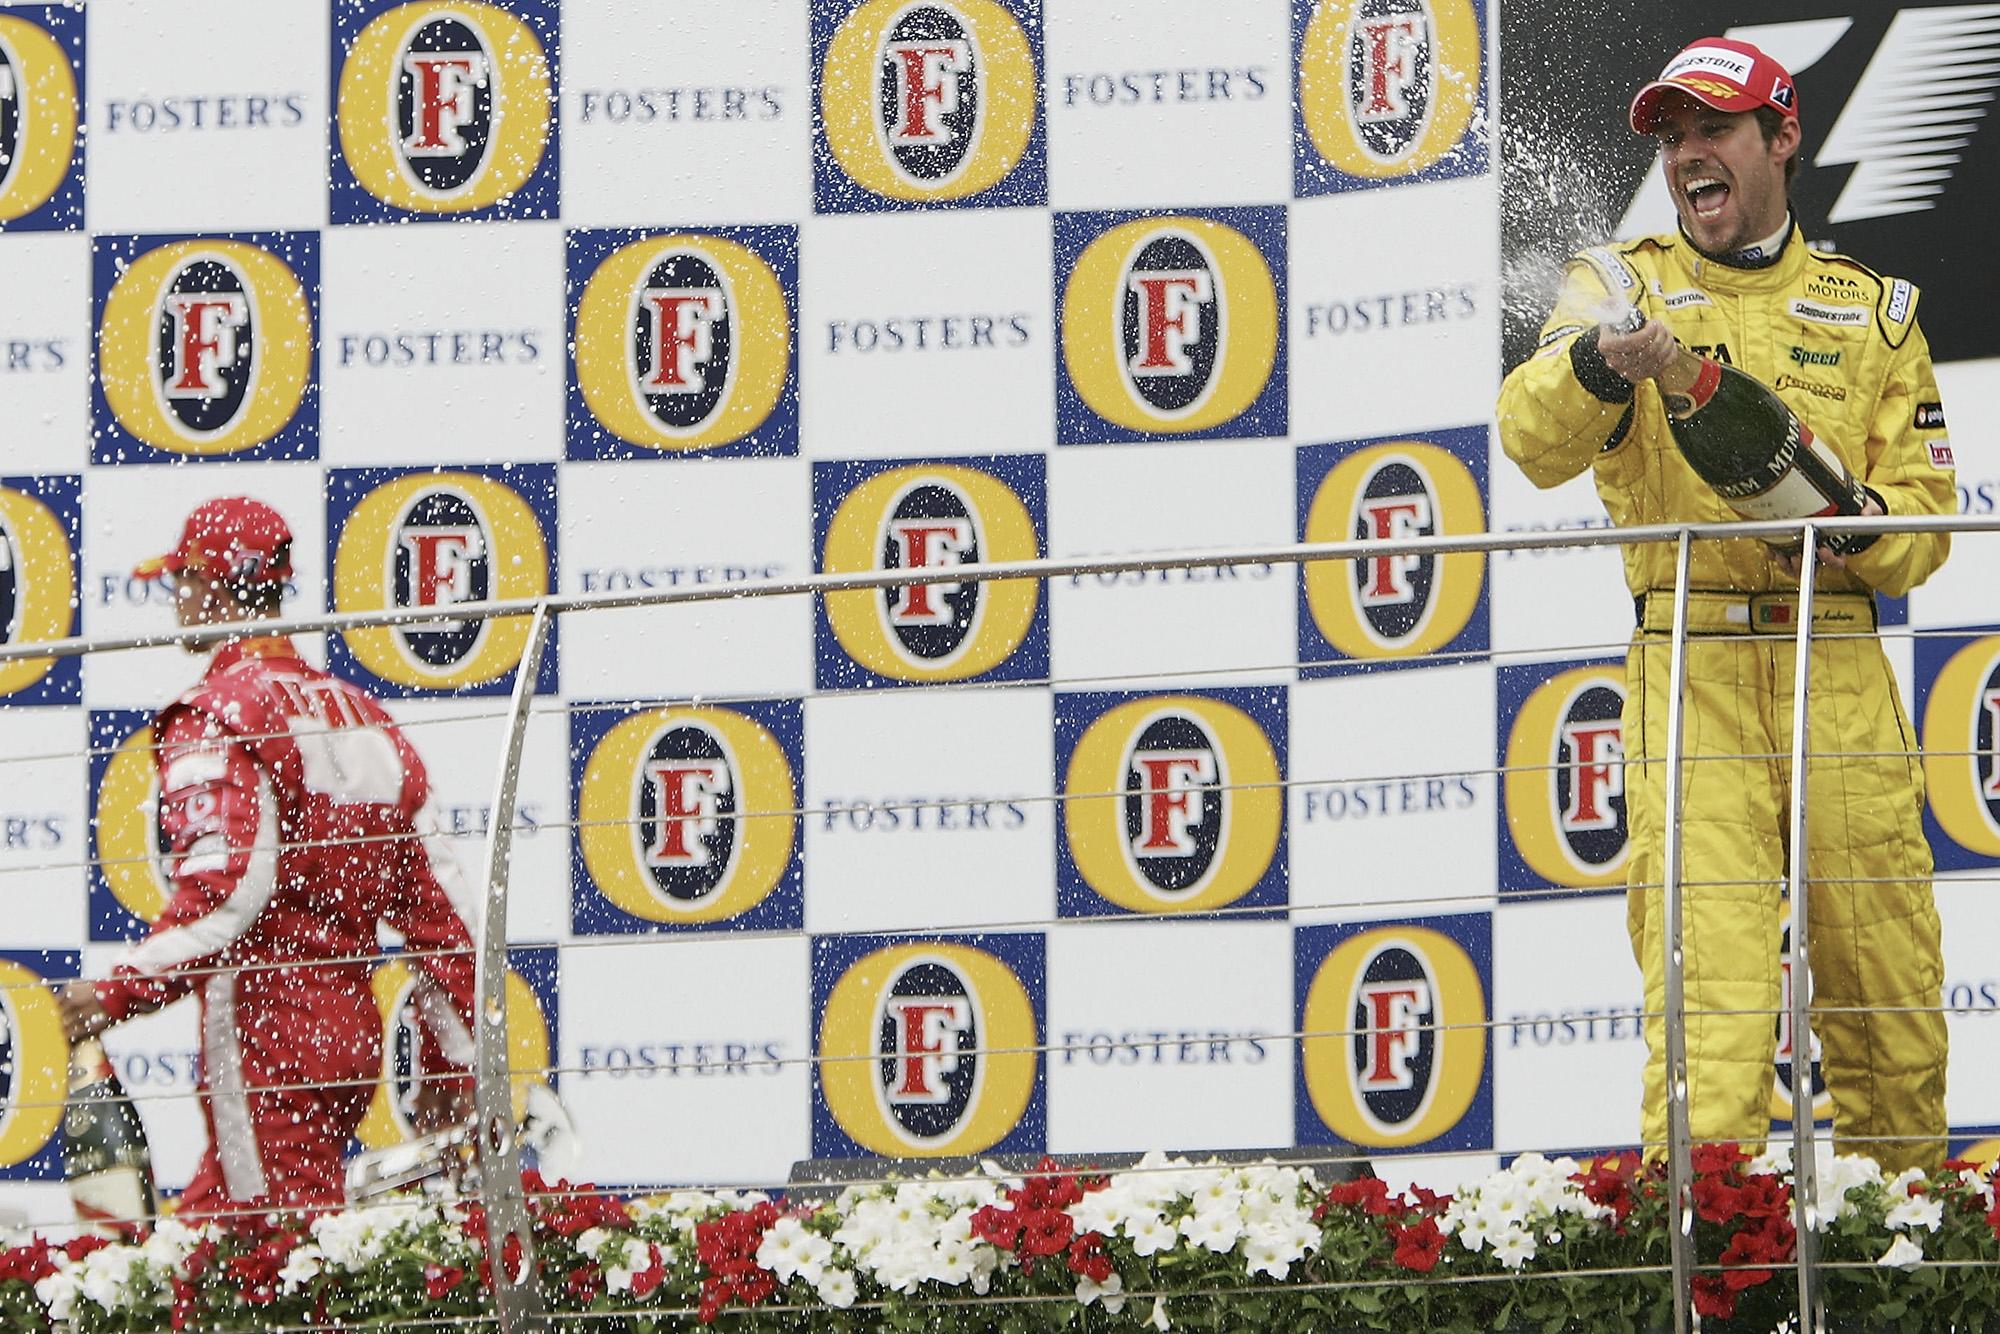 Tiago Monteiro sprays champagne as Michael Schumacher walks off the podium at the 2005 US Grand Prix